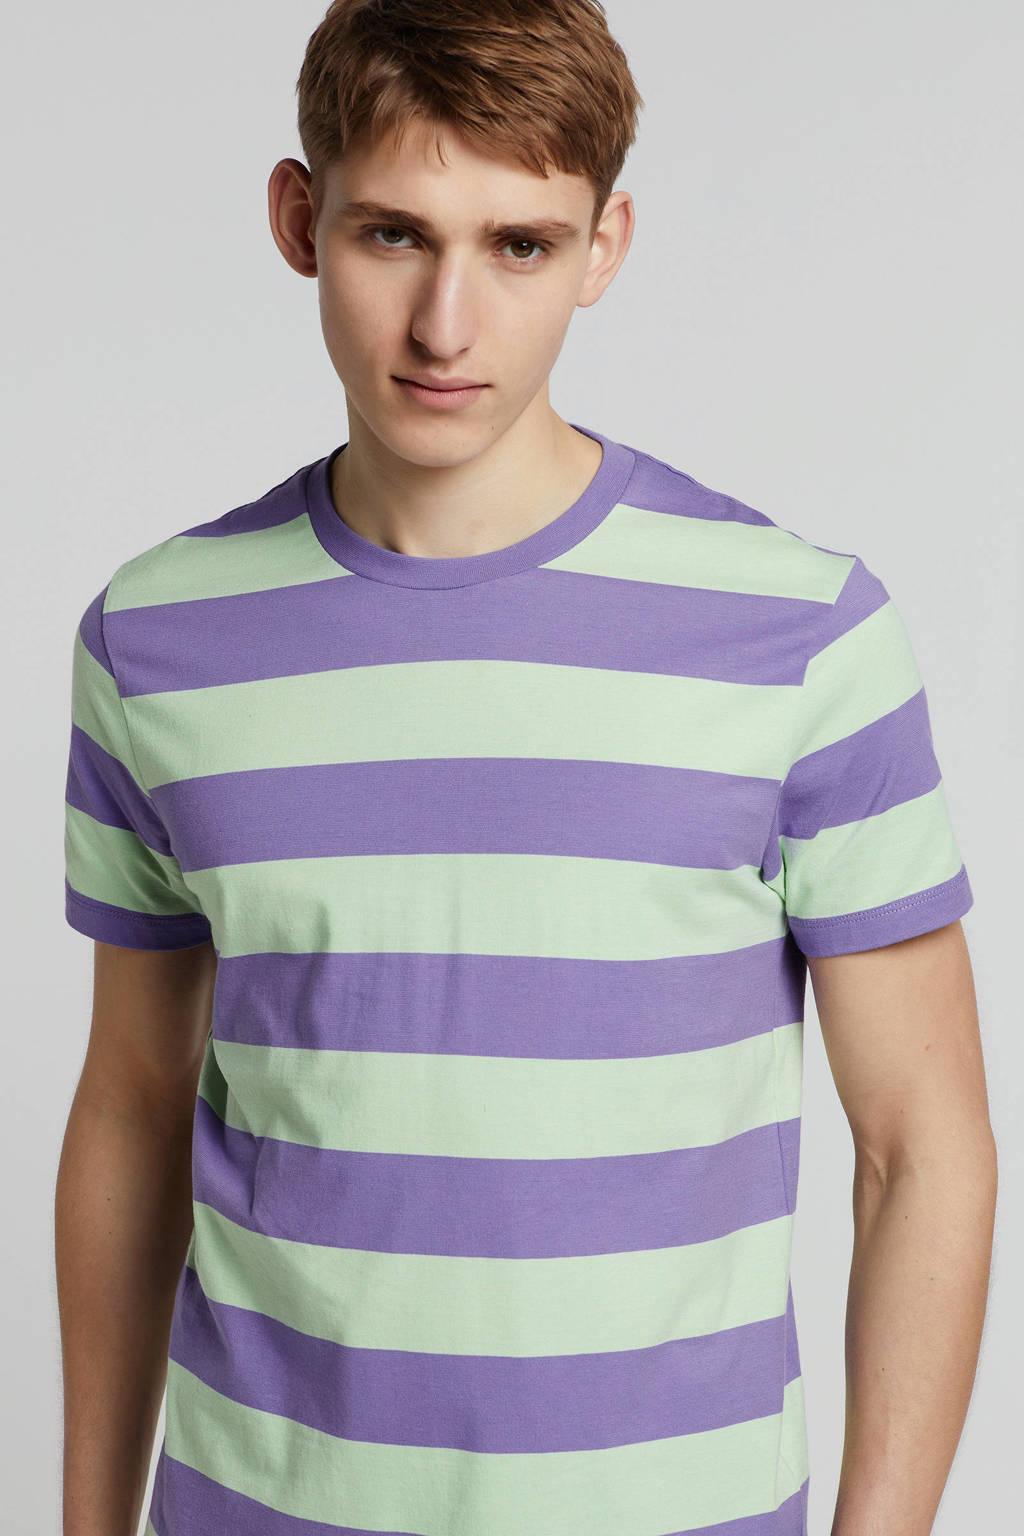 Scotch & Soda T-shirt met streepdessin, Paars/groen